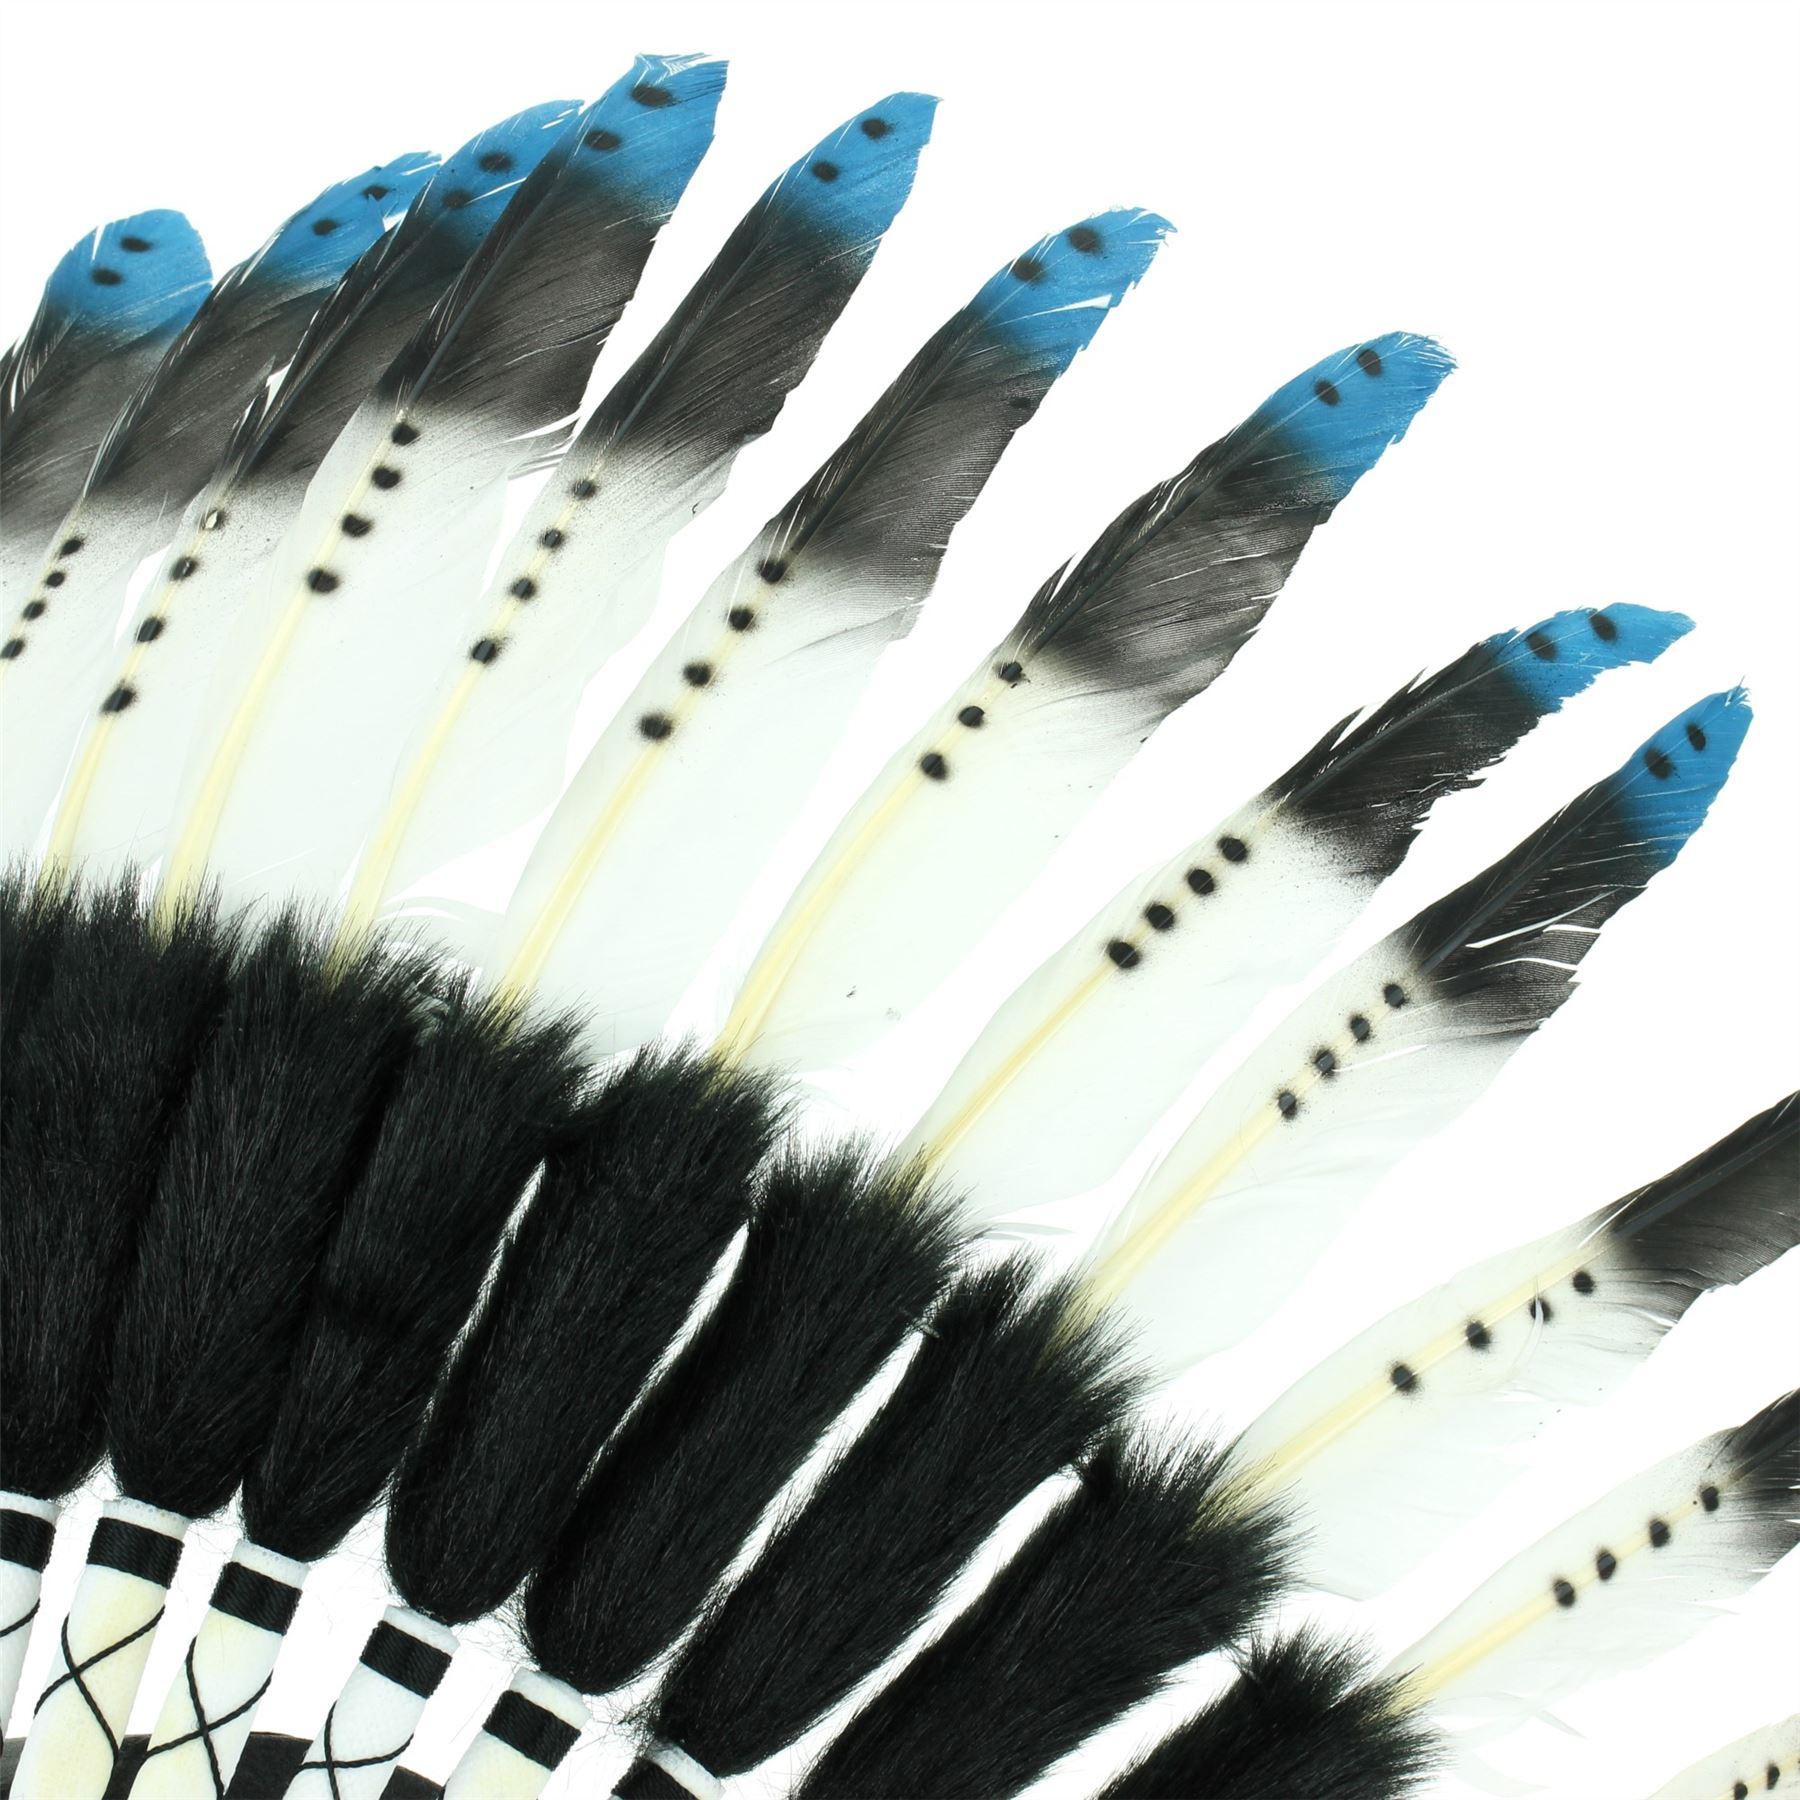 Indianischer Kopfschmuck Häuptling Federn Bonnet Indianer Gringo Leder Tipps